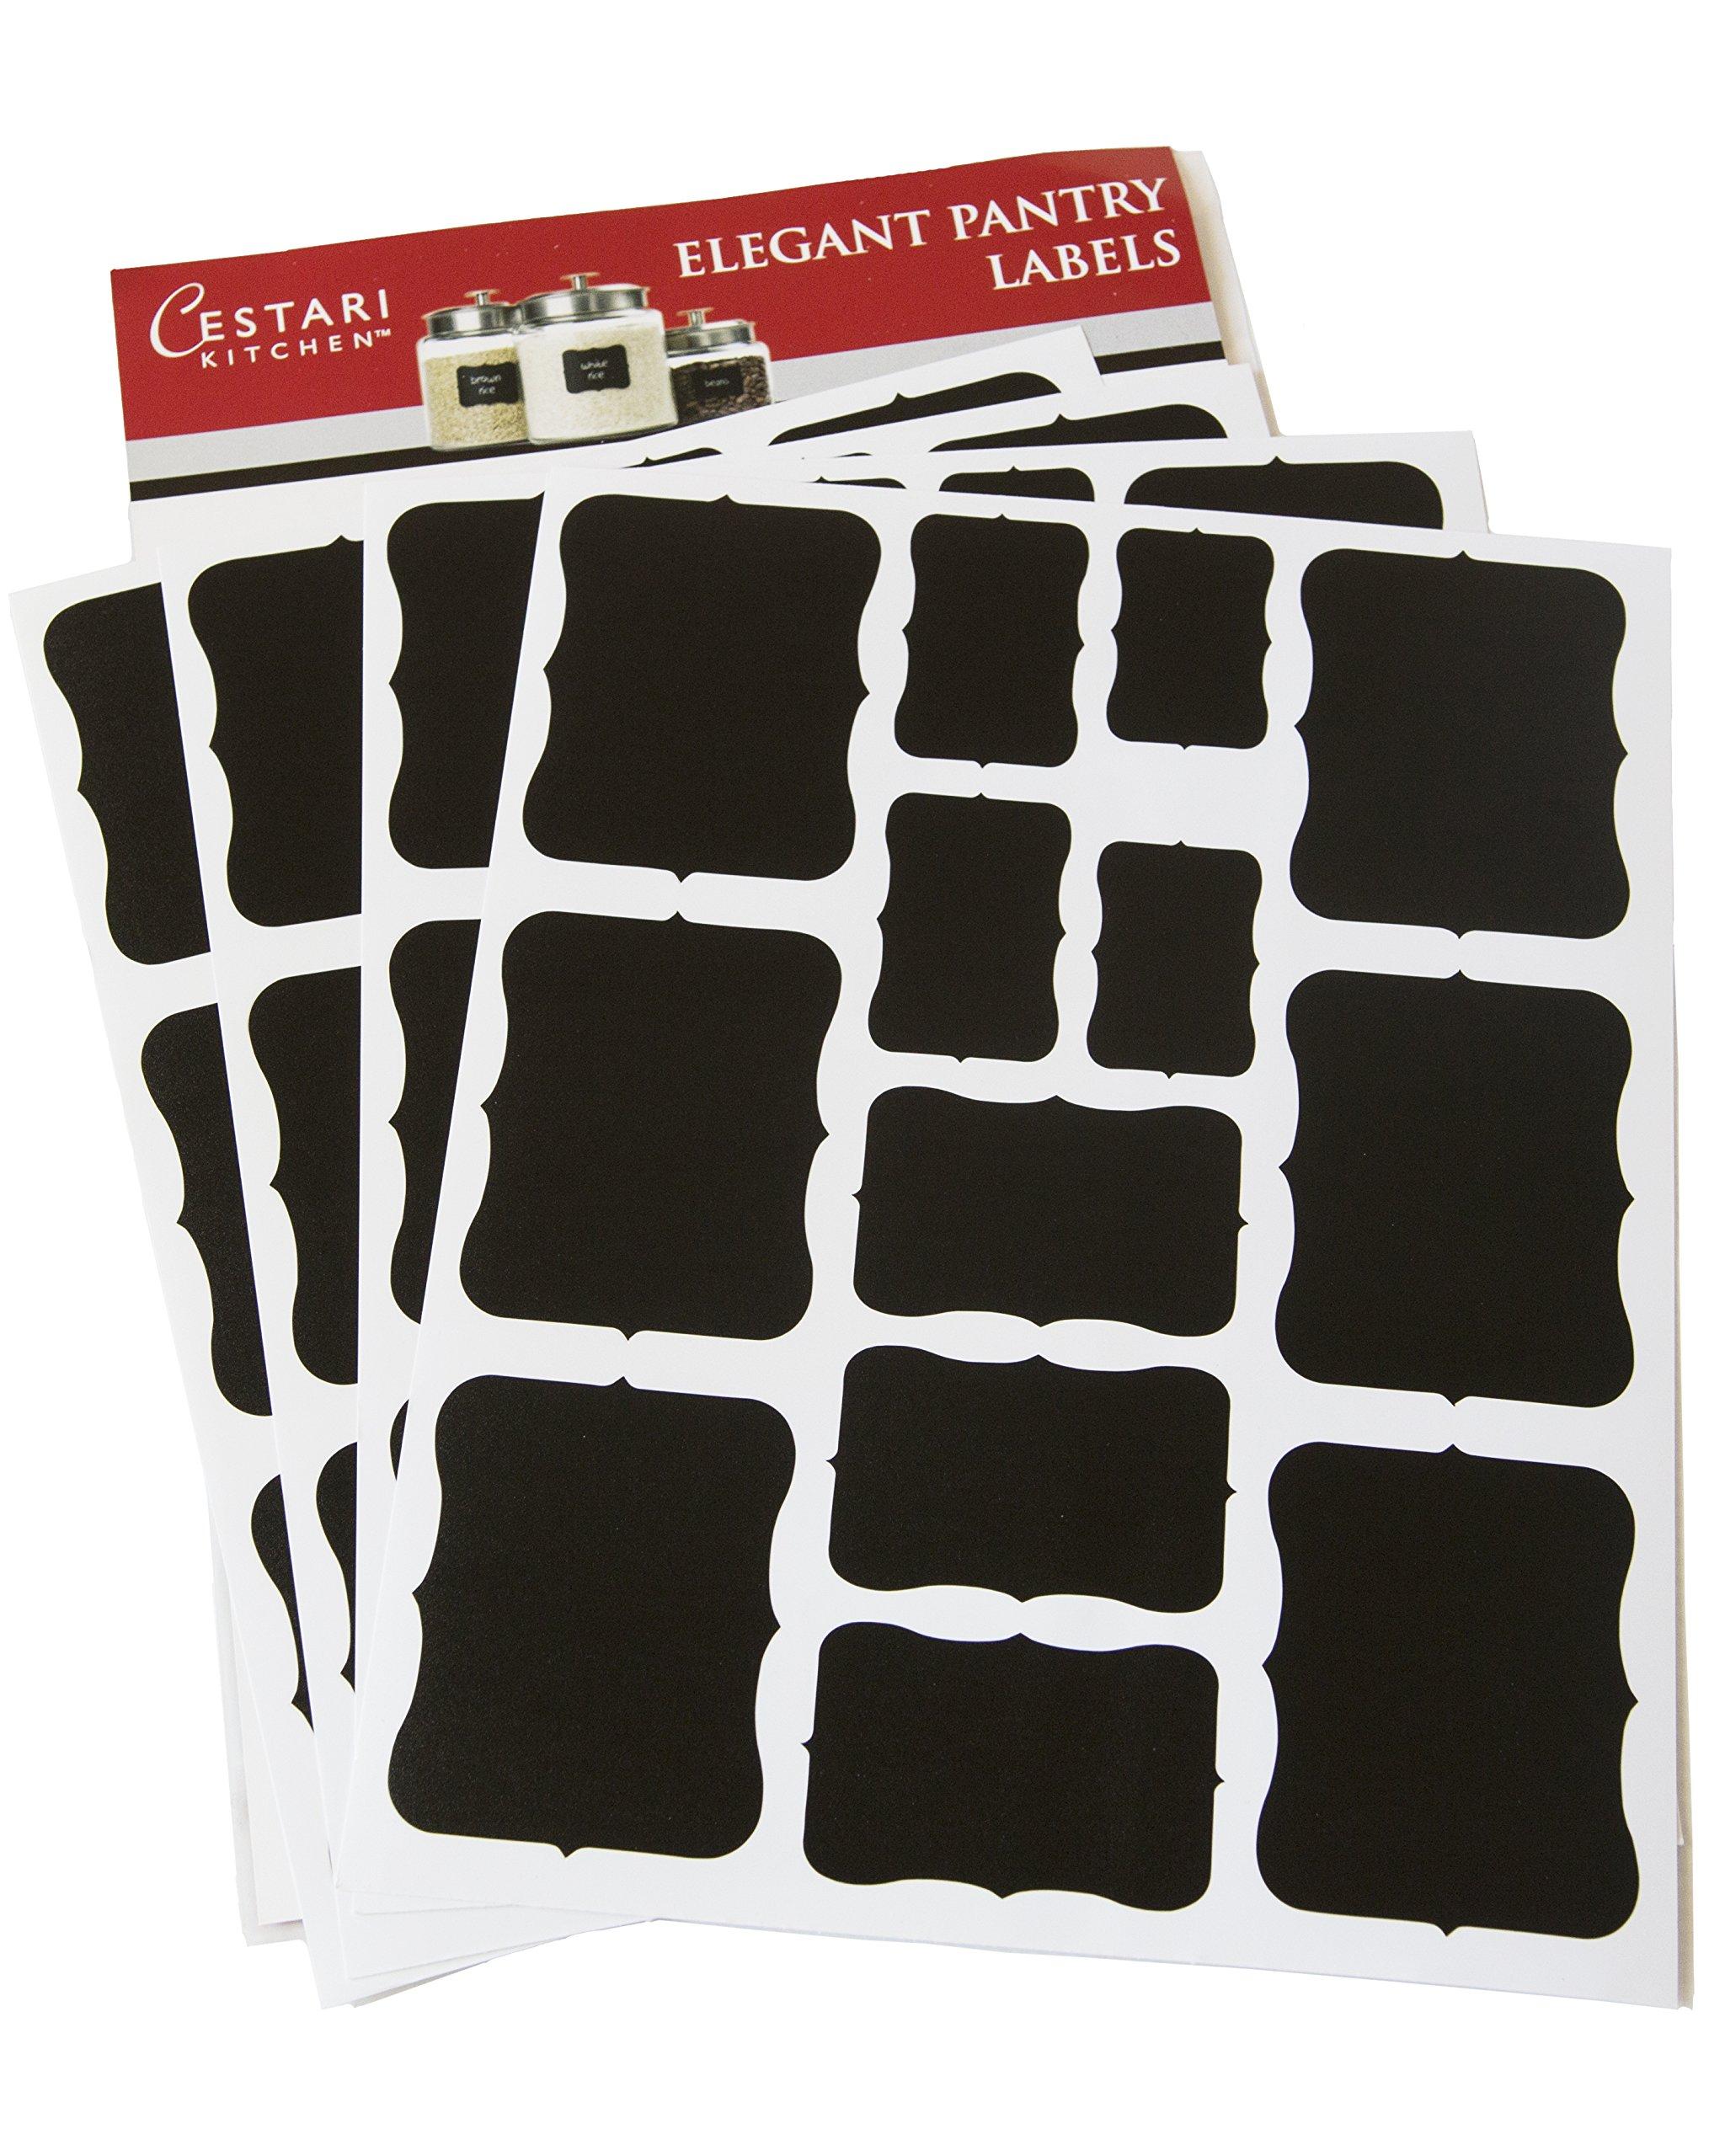 Chalkboard Labels Set Of 52 Assorted Premium Reusable Decorative